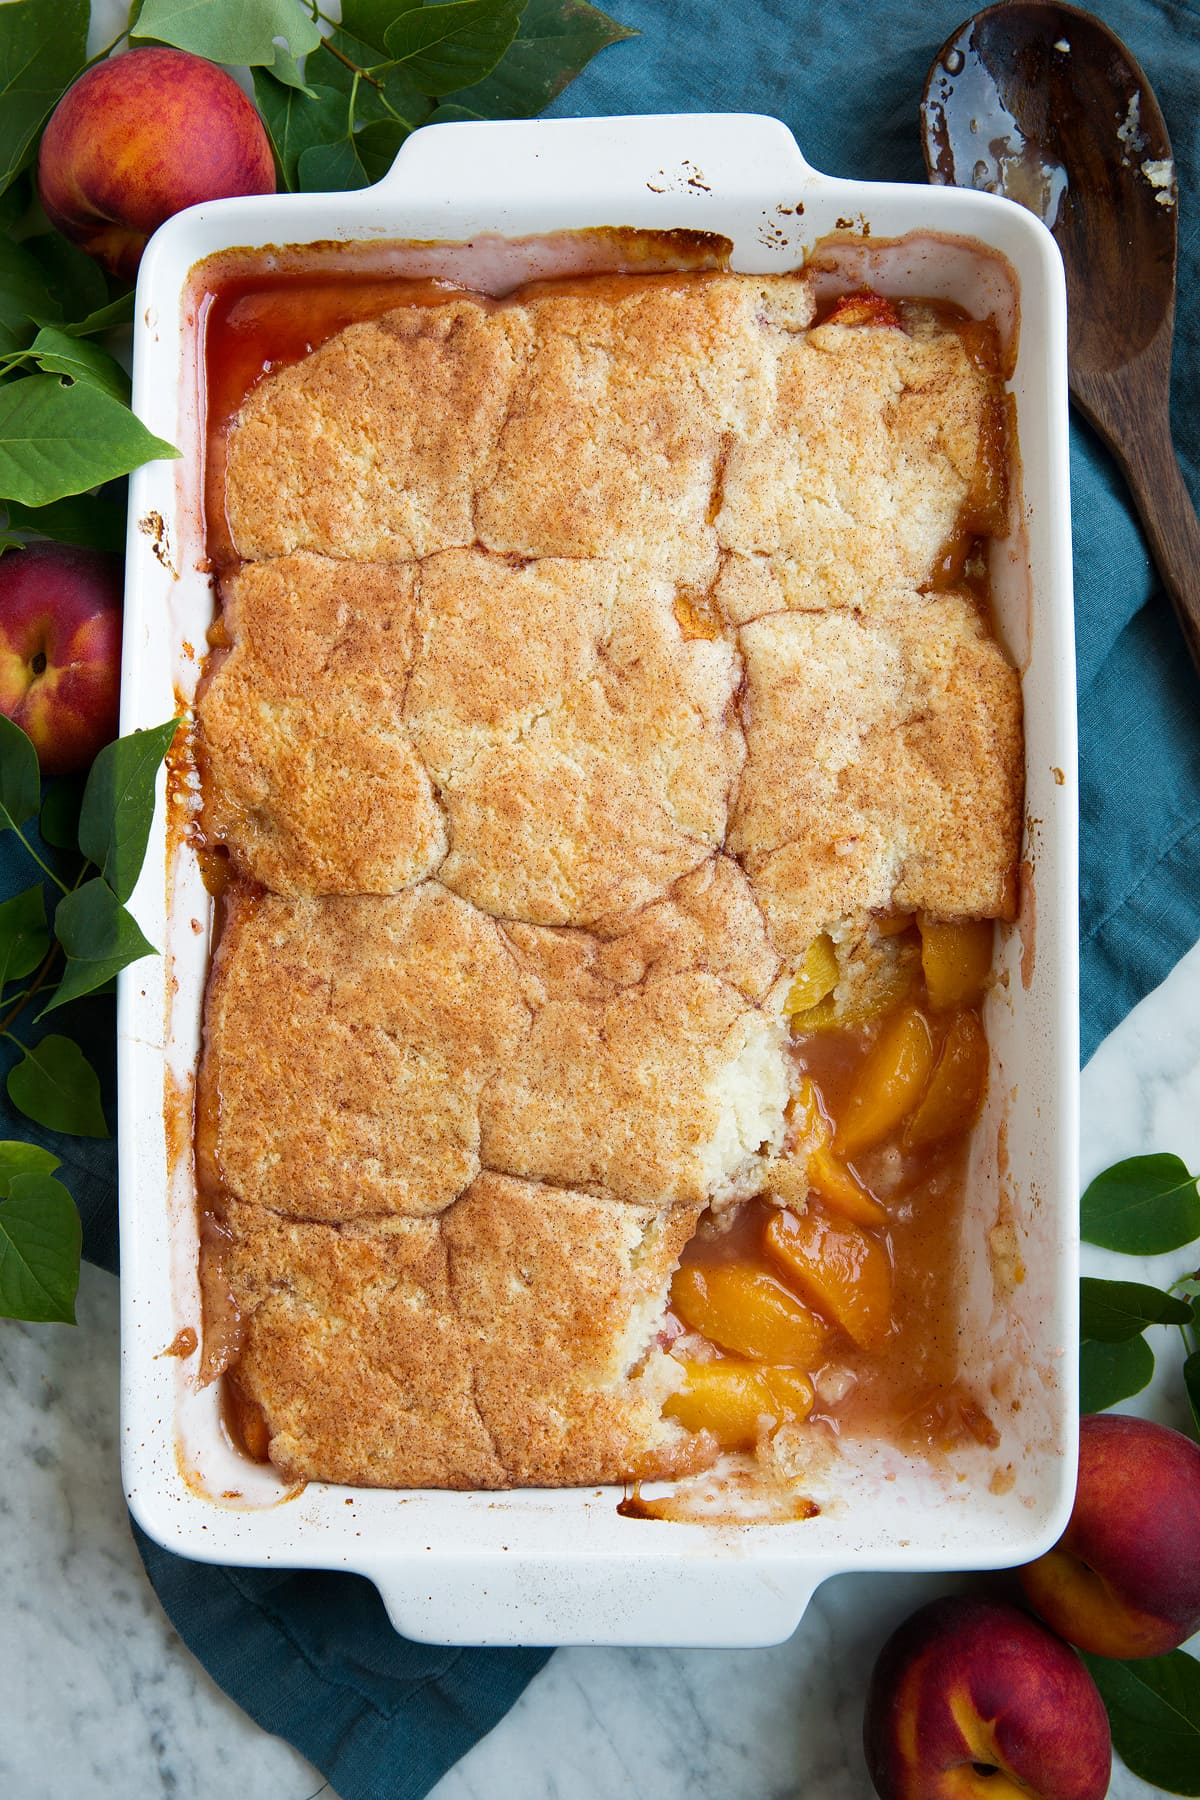 Whole pan of peach cobbler.